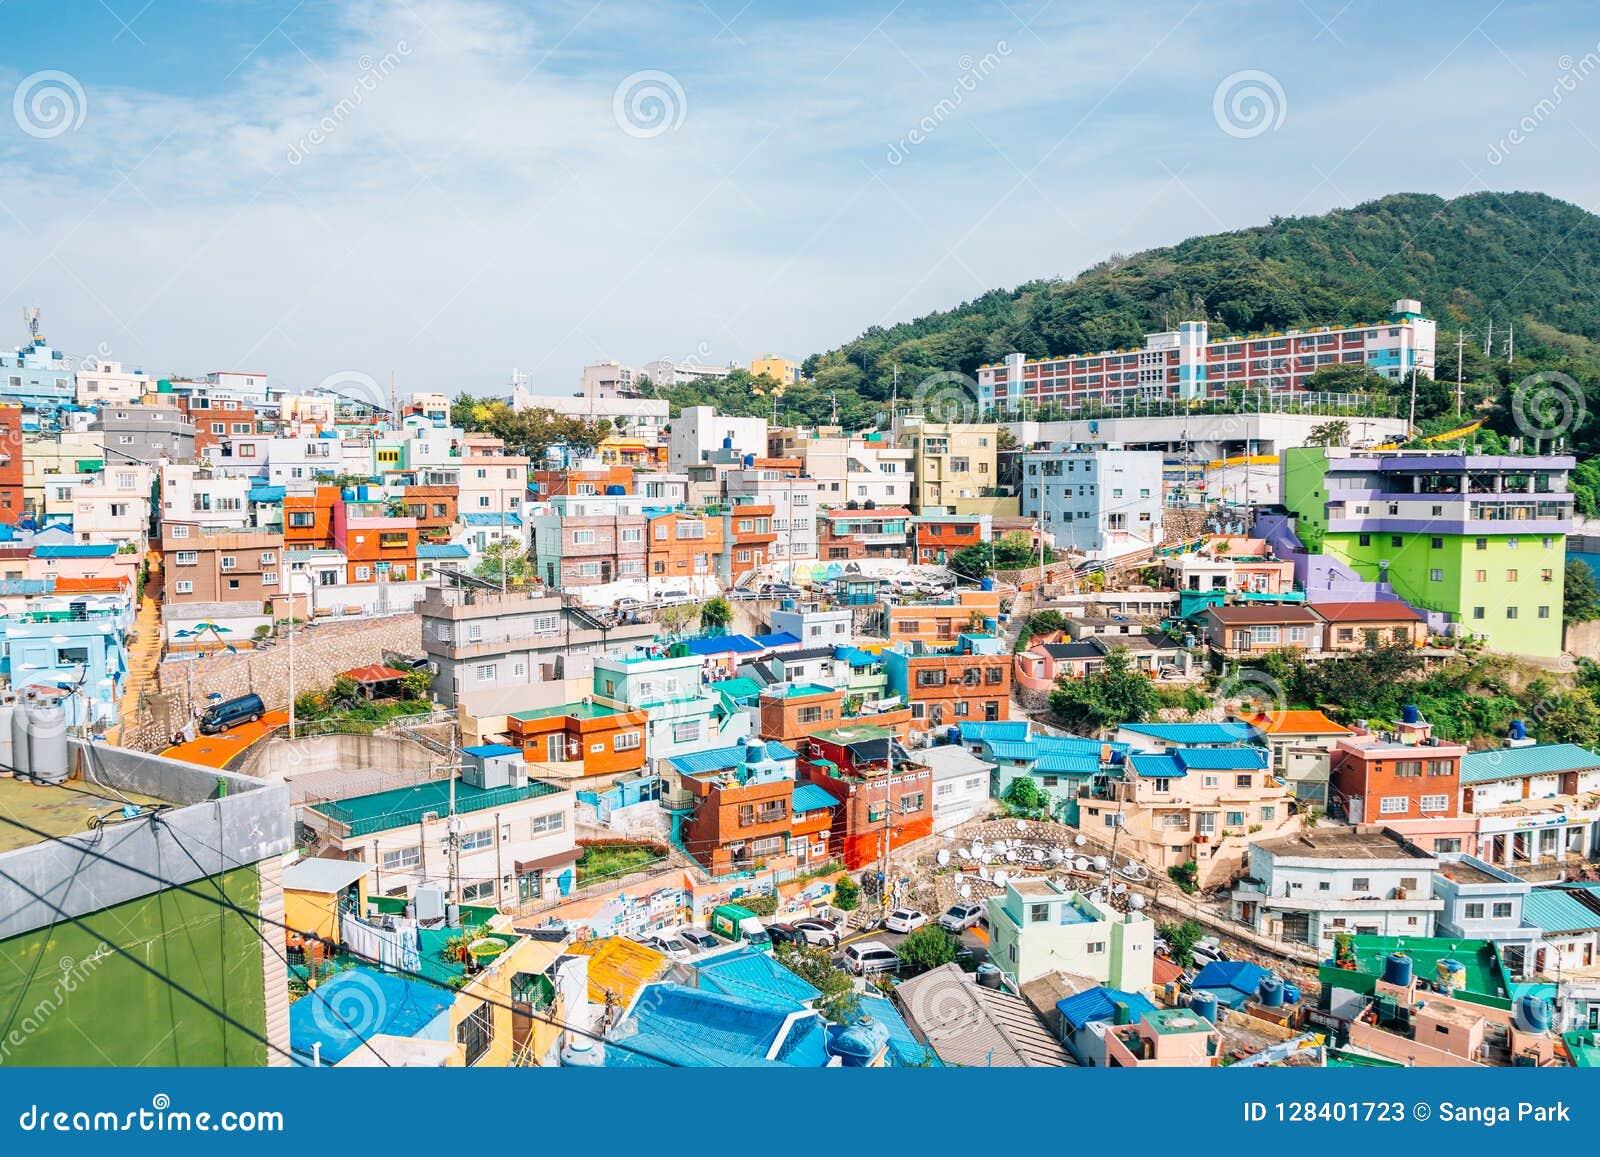 Vila da cultura de Gamcheon em Busan, Coreia